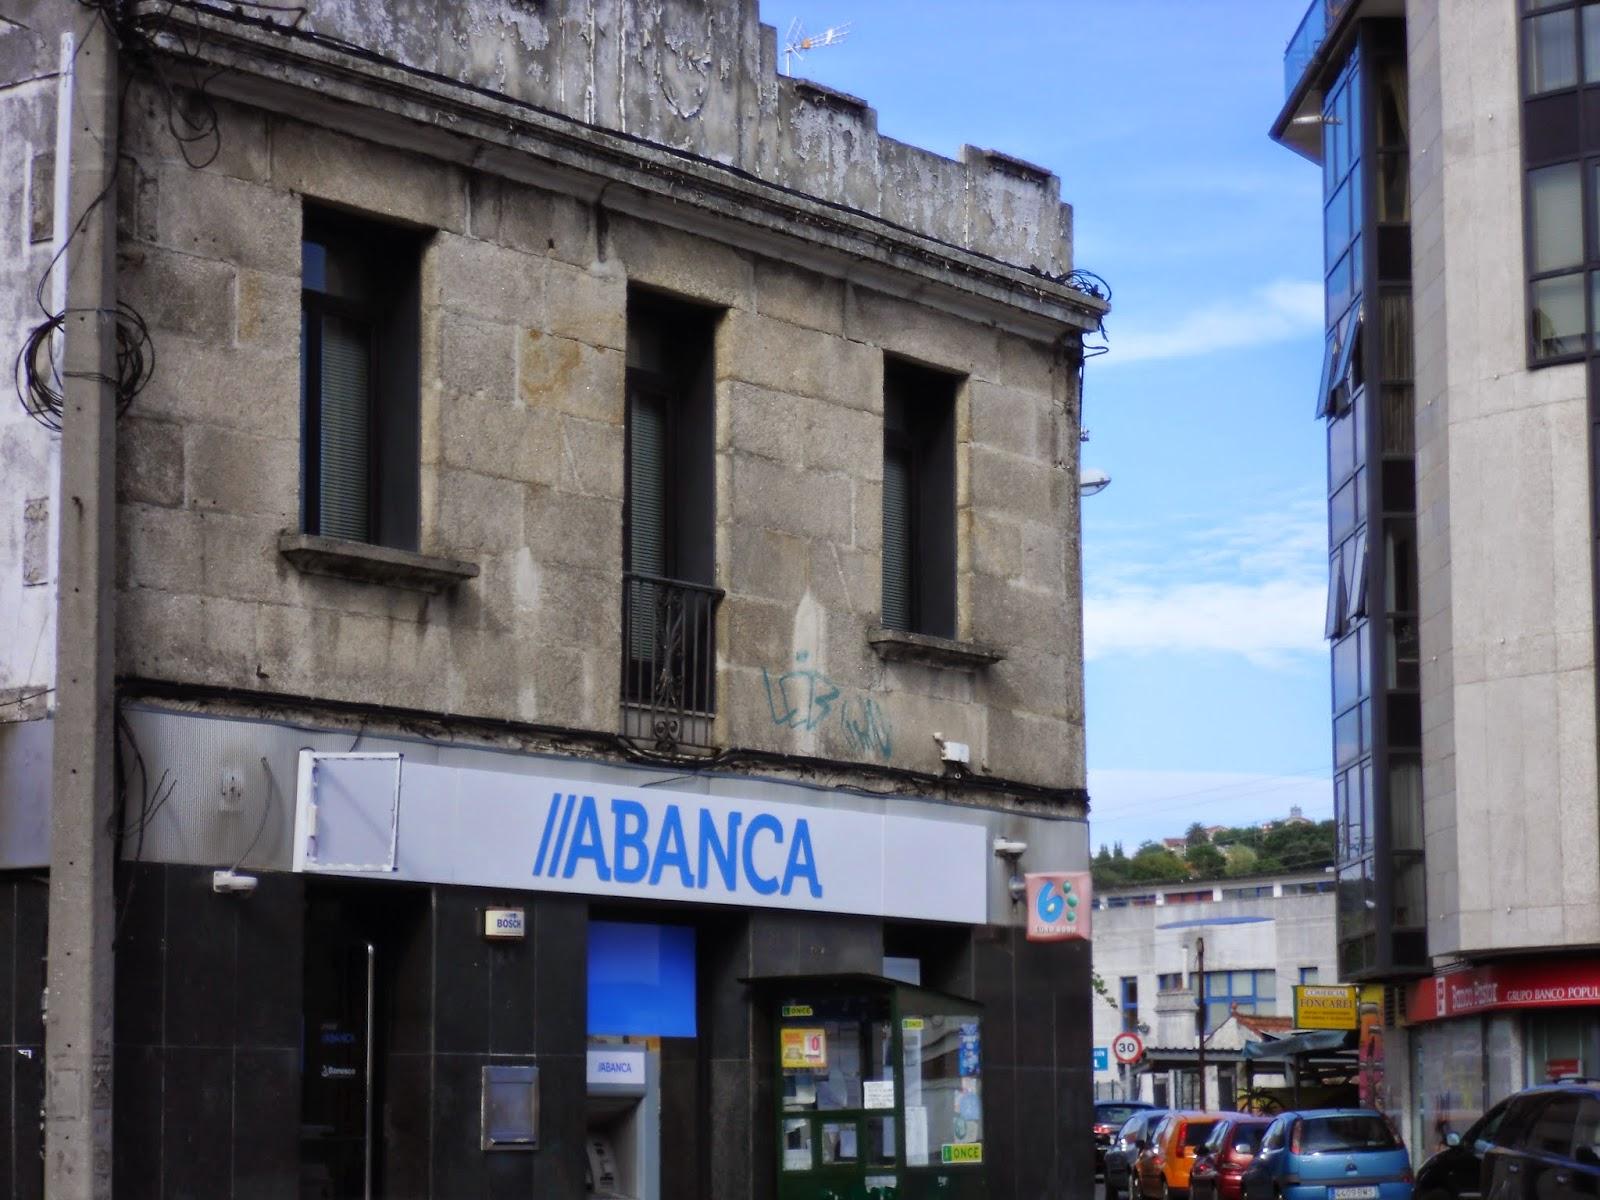 Parada solicitada junio 2014 for Novagalicia horario oficinas